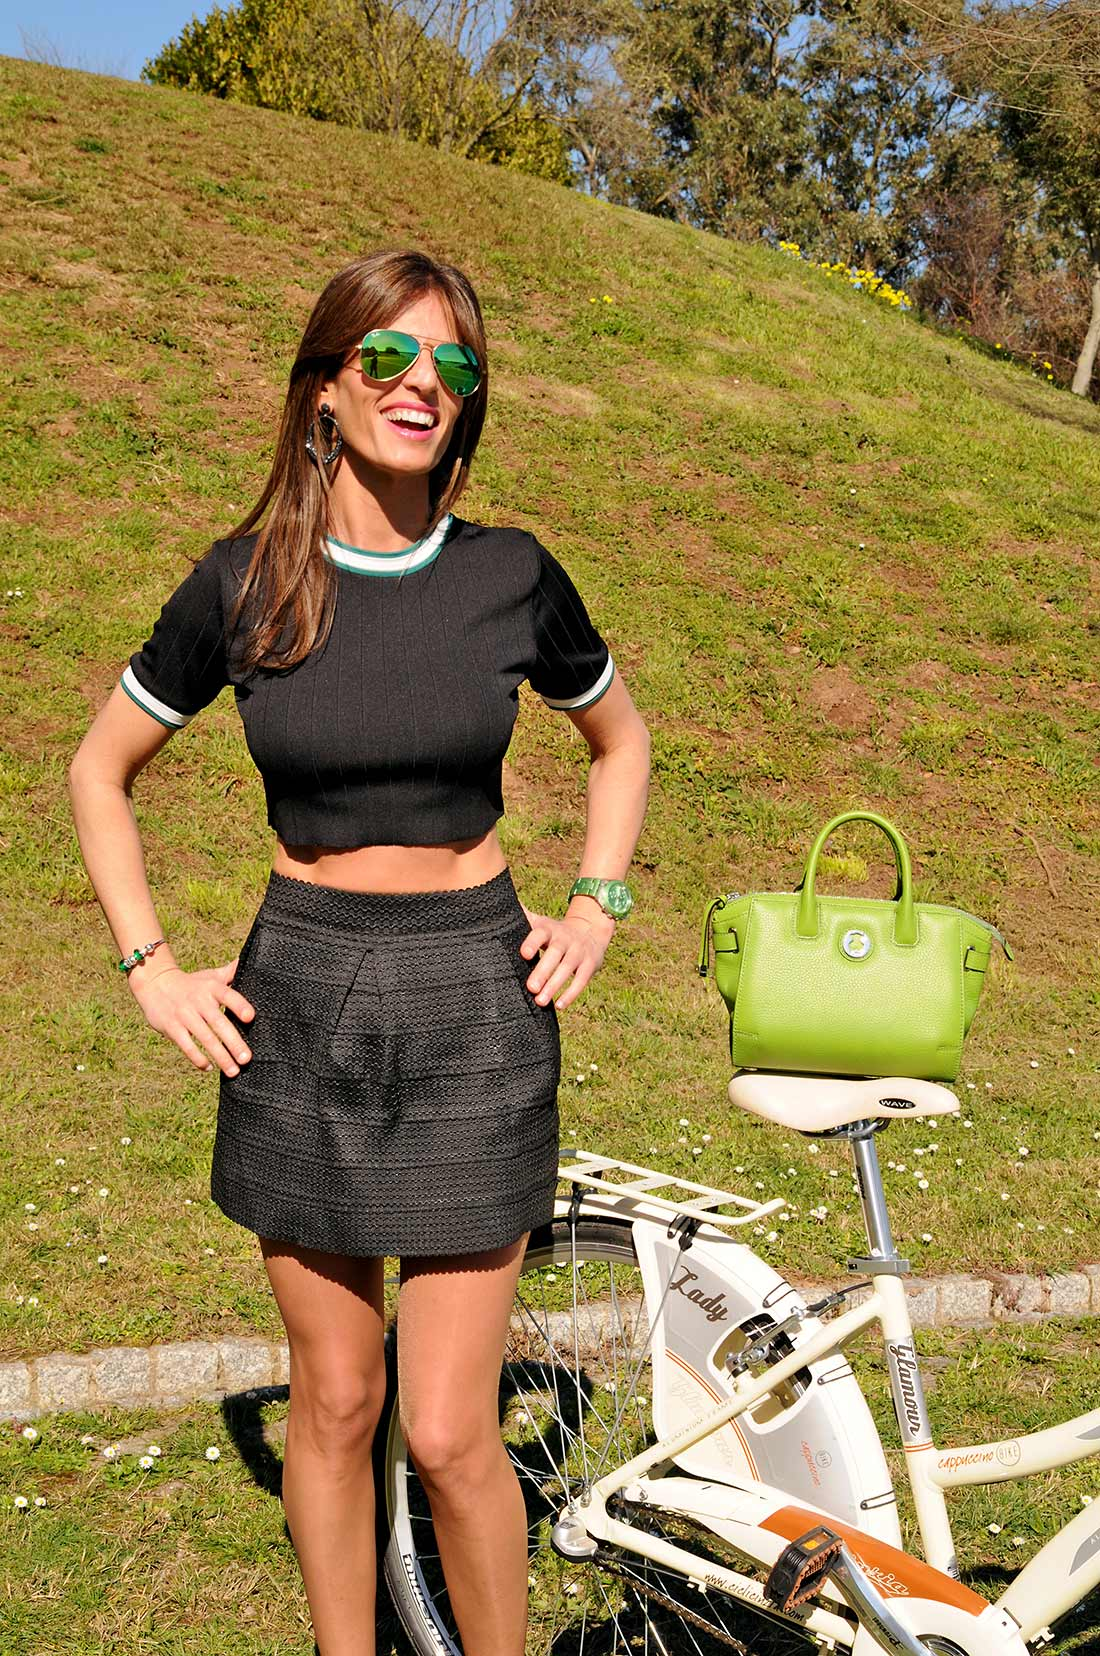 simply-mathilda-paseo-en-bicicleta-18